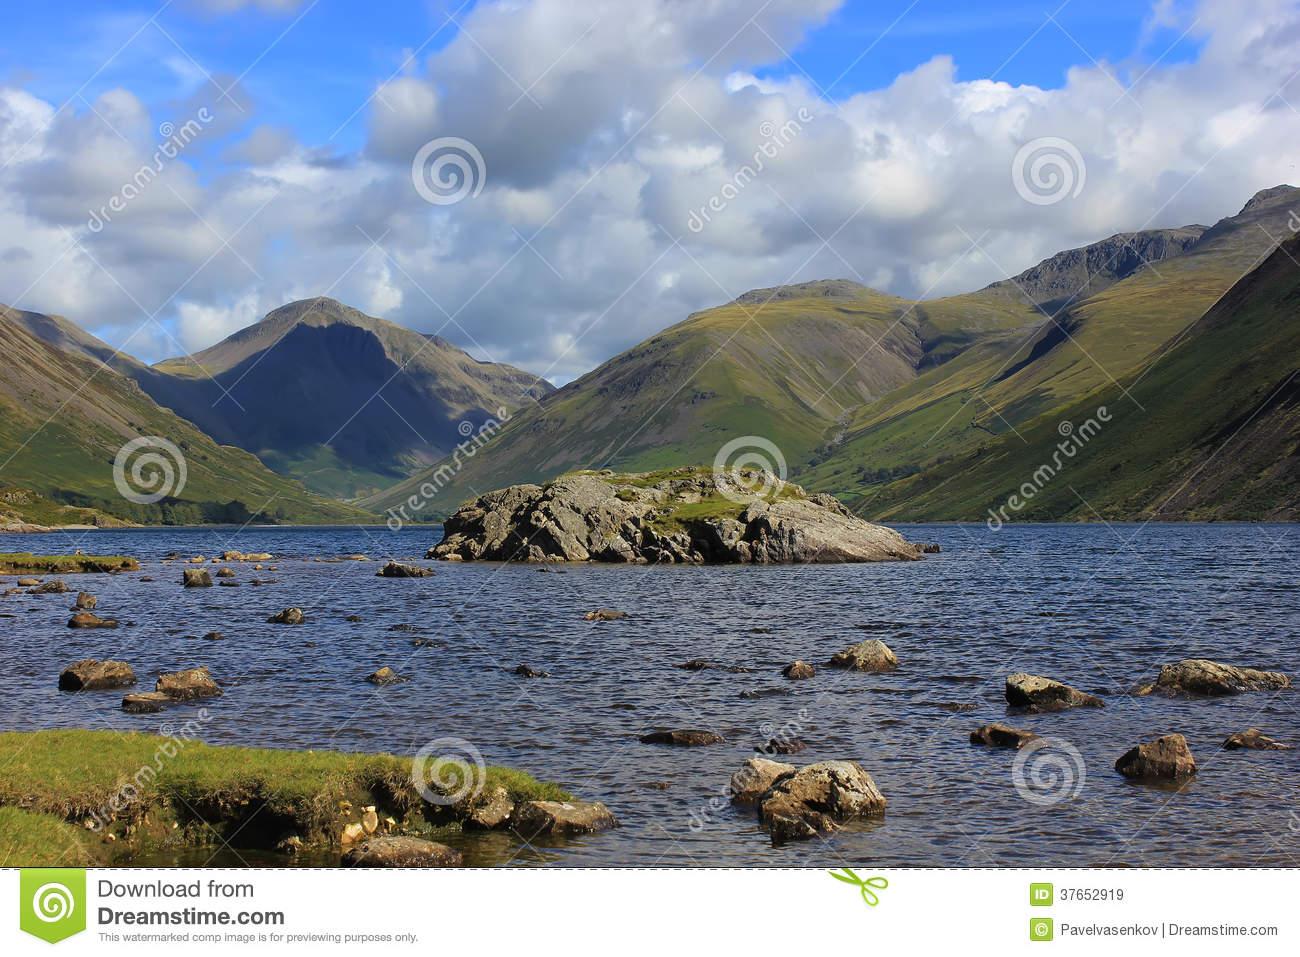 Lake District (UK) clipart #16, Download drawings